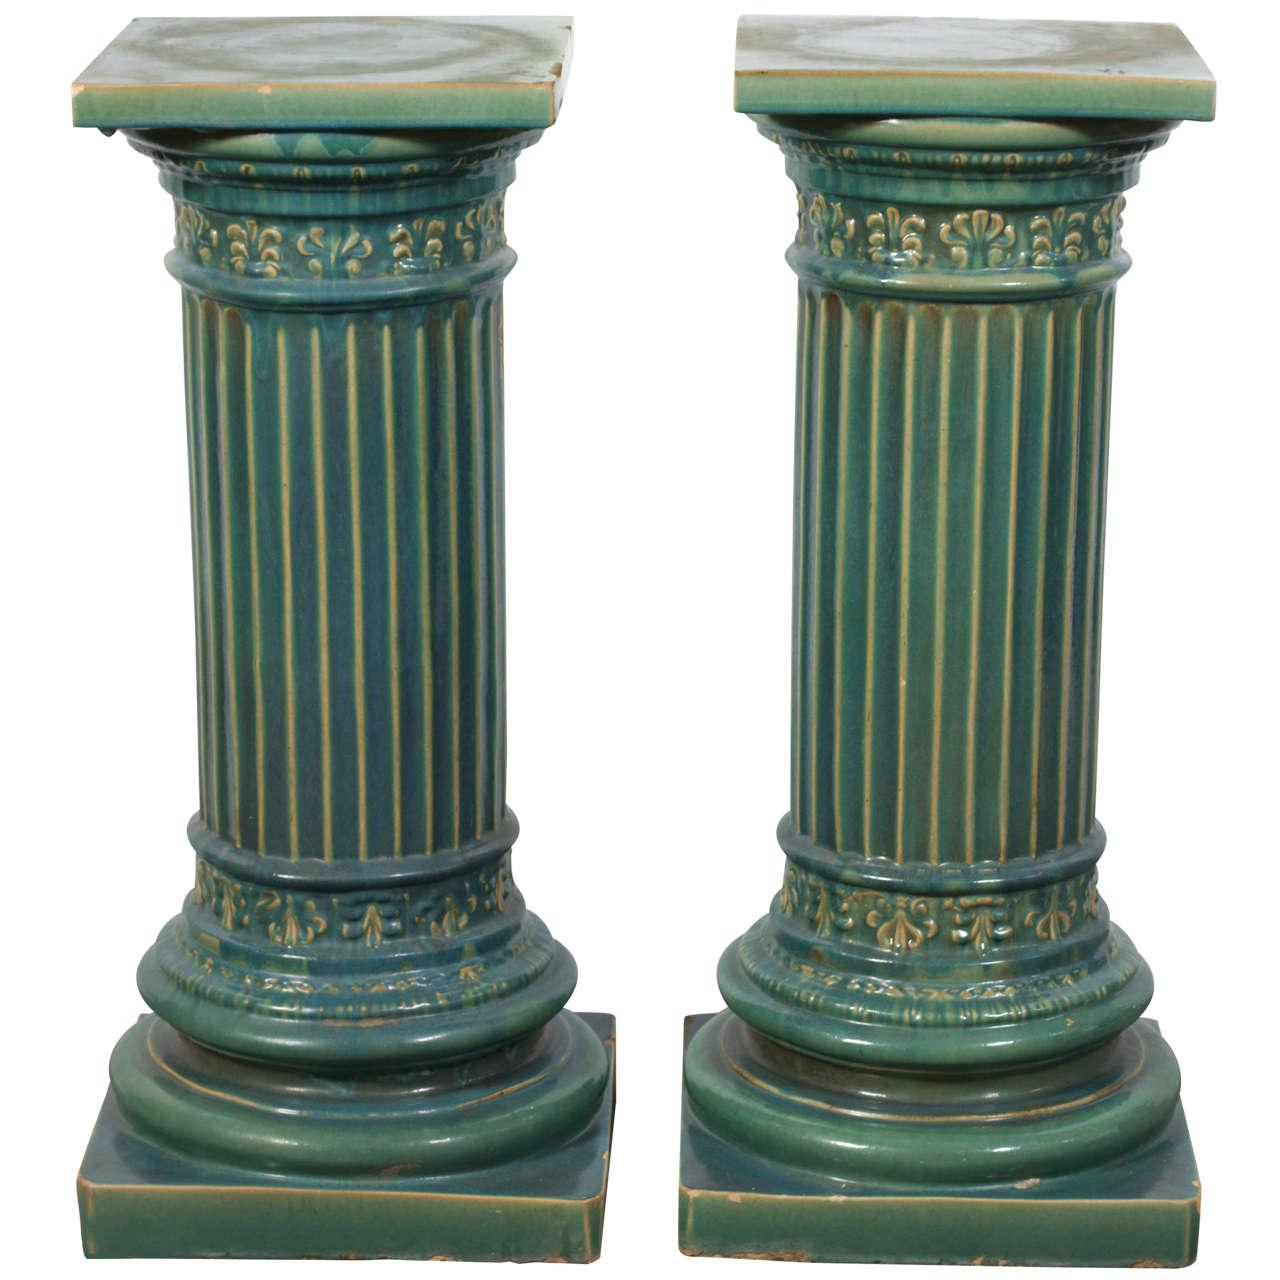 for Doric columns